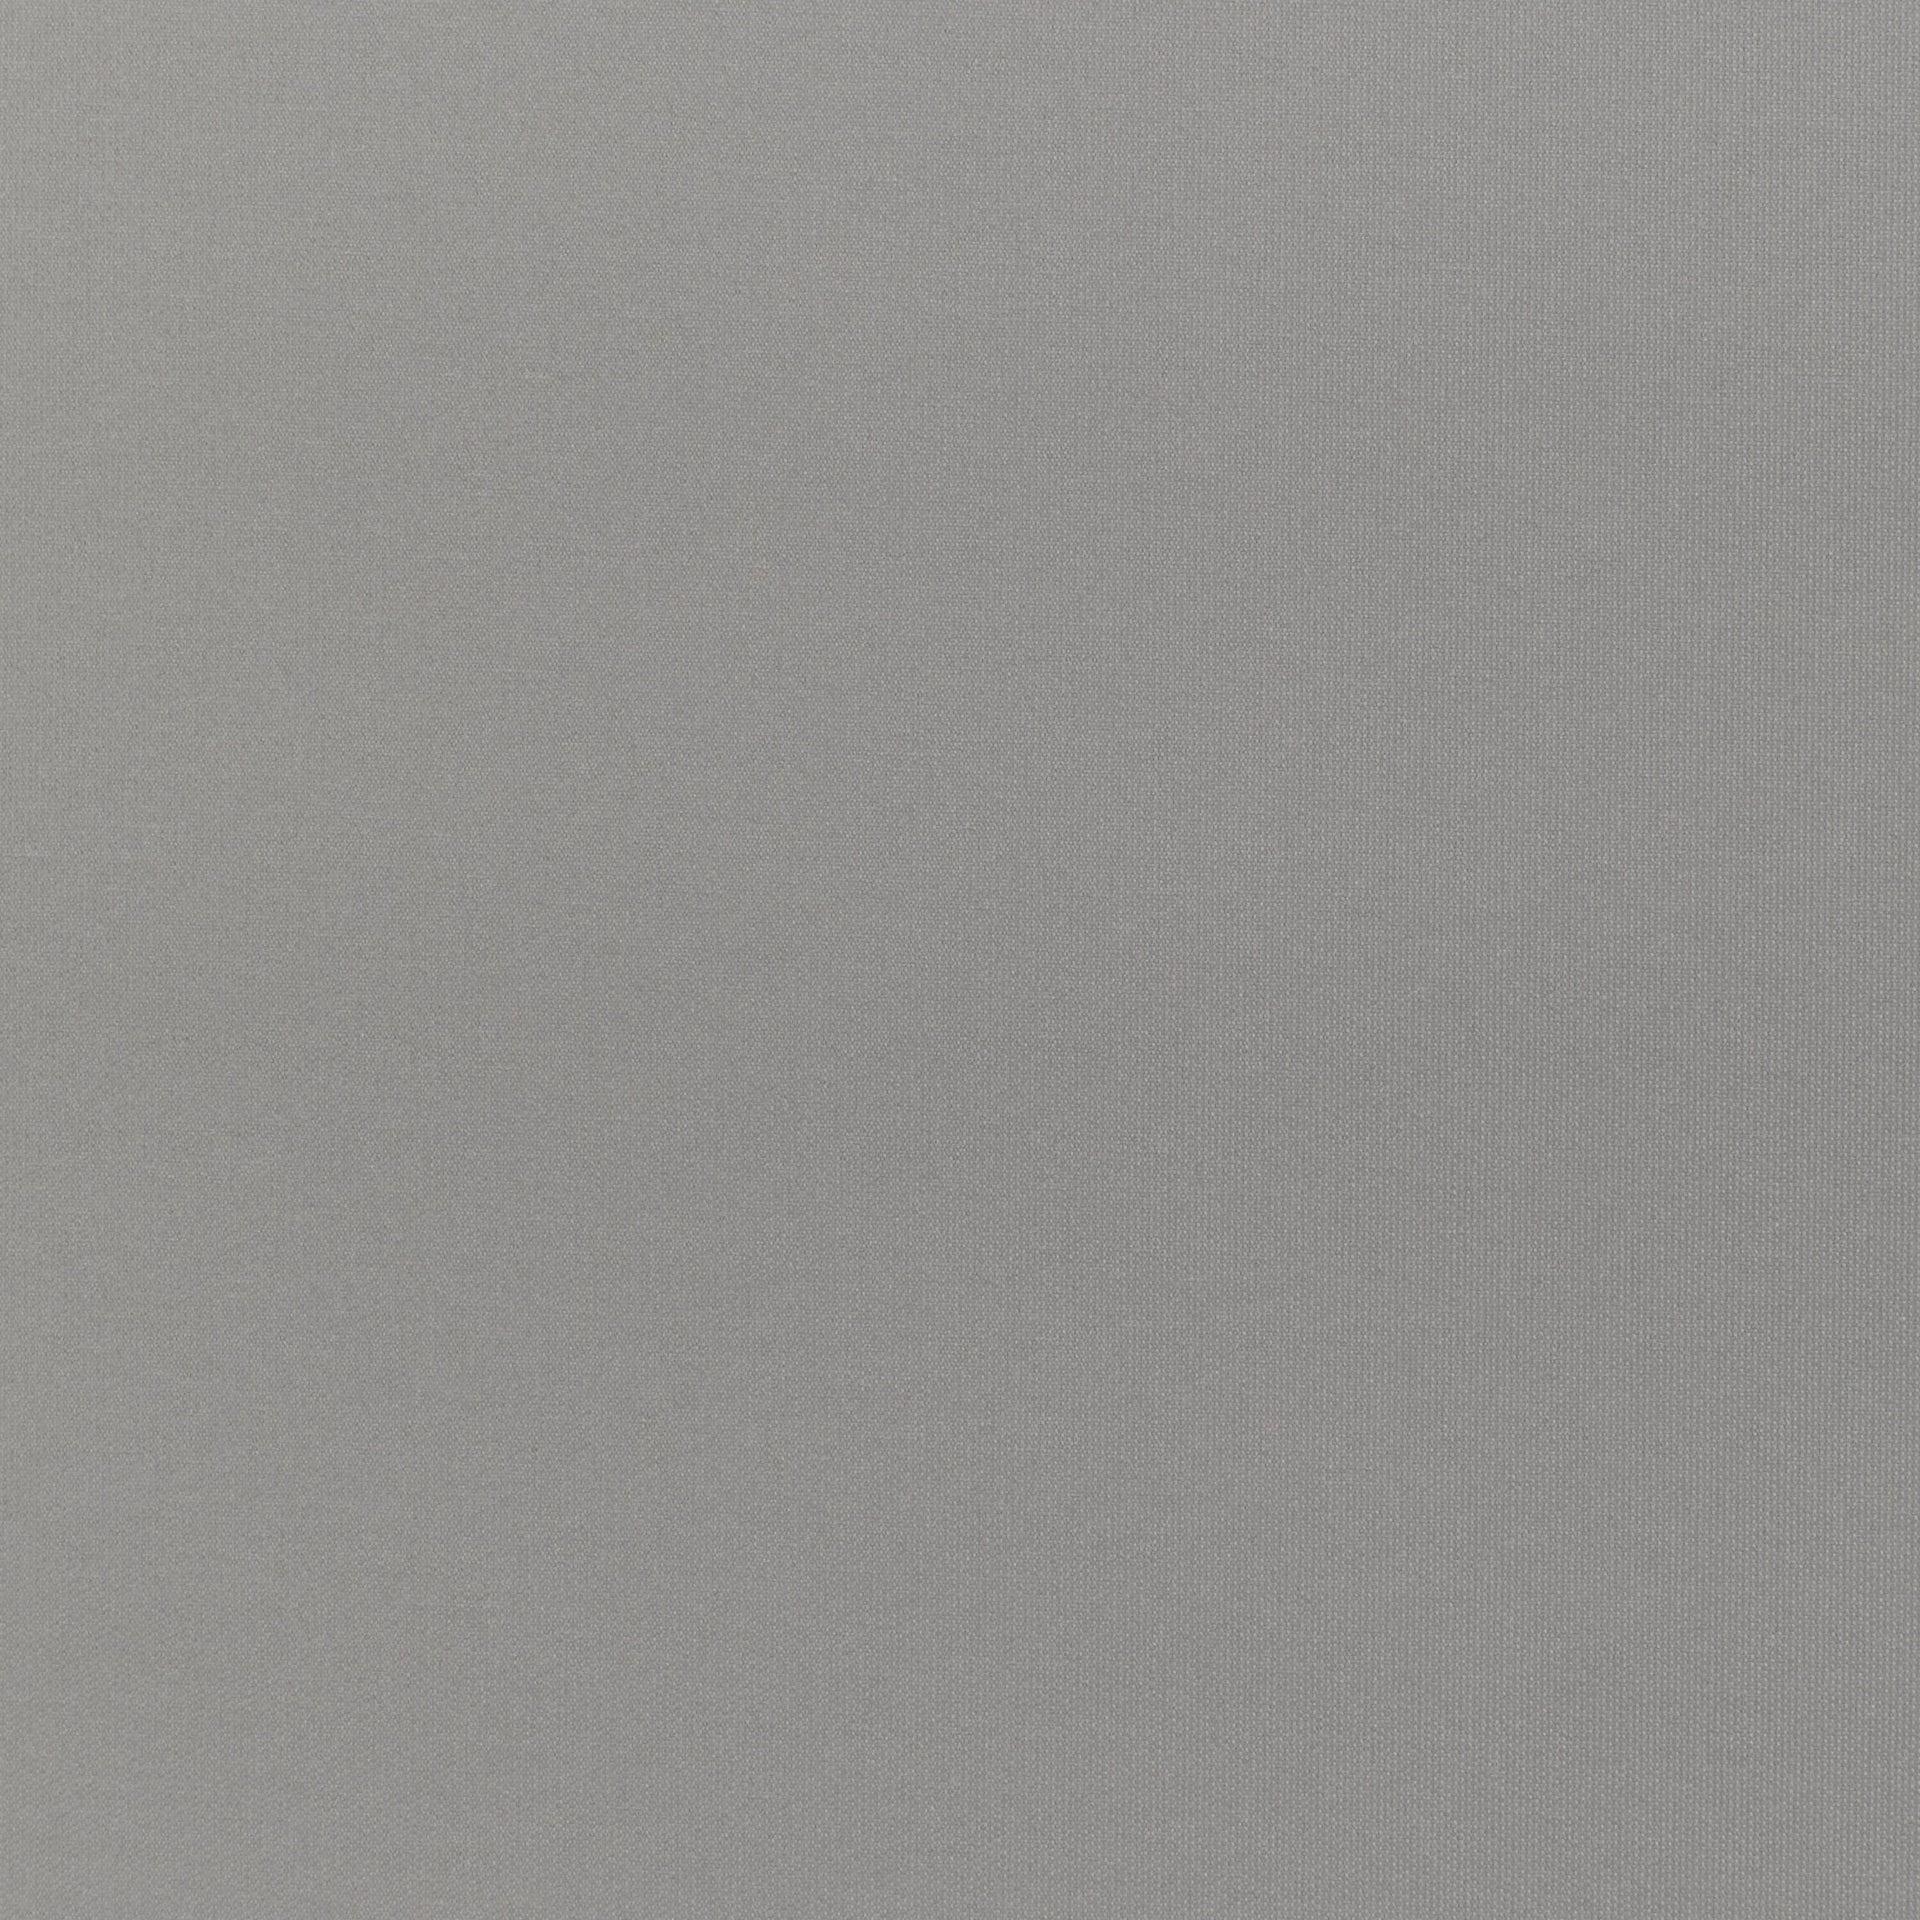 Tenda a rullo oscurante INSPIRE Tokyo grigio 55 x 160 cm - 5